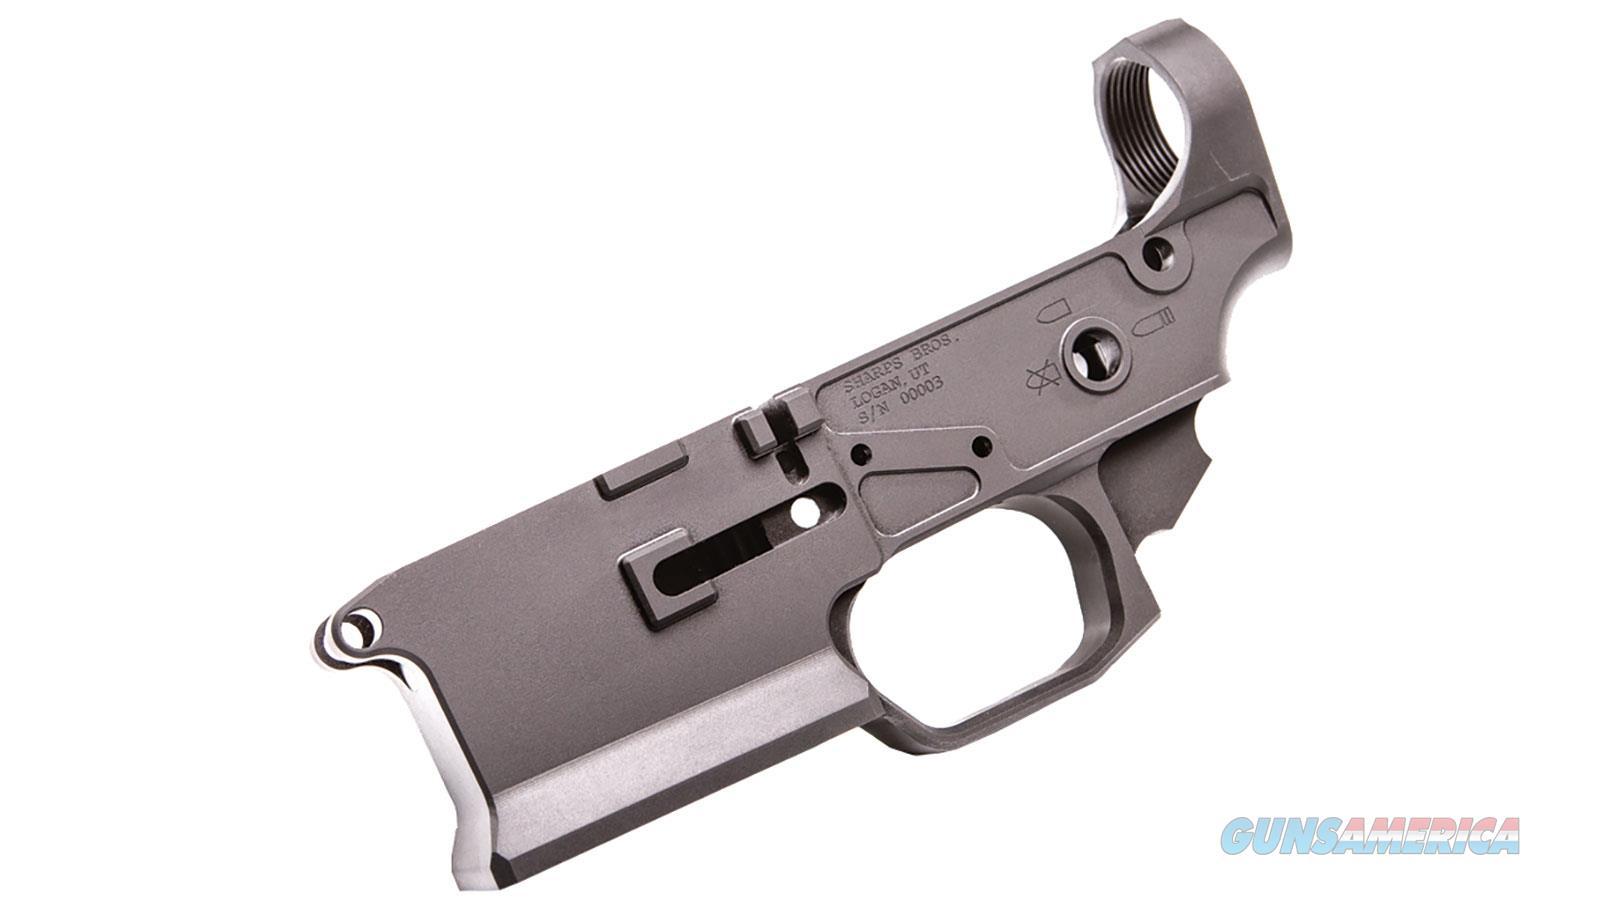 Sharps Bros Livewire Ar15 SBLR08  Guns > Rifles > S Misc Rifles